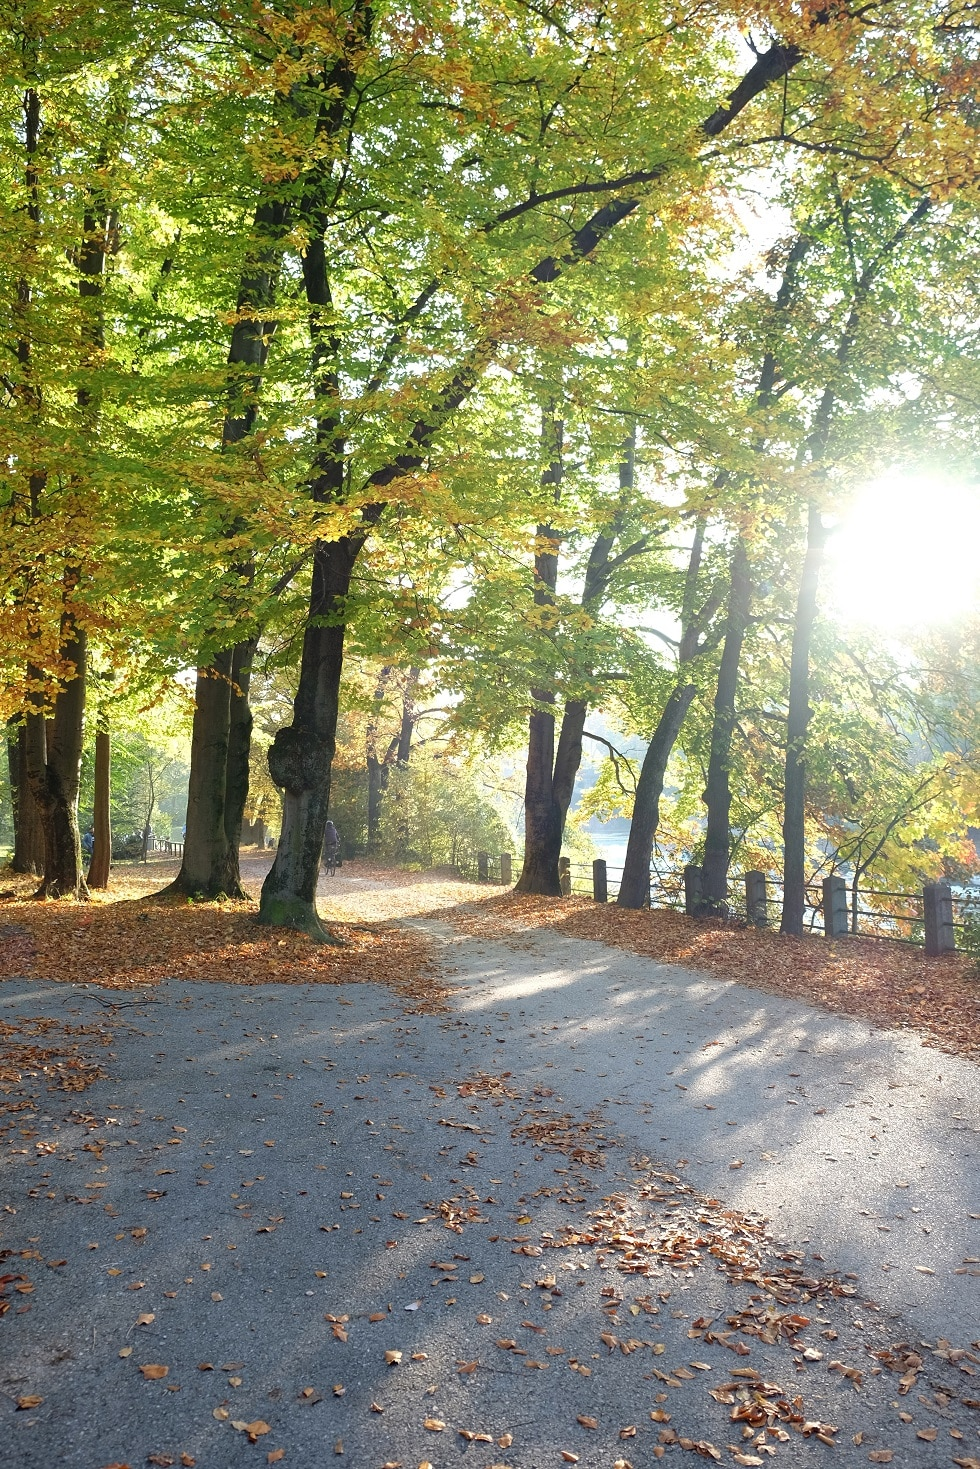 munchen park